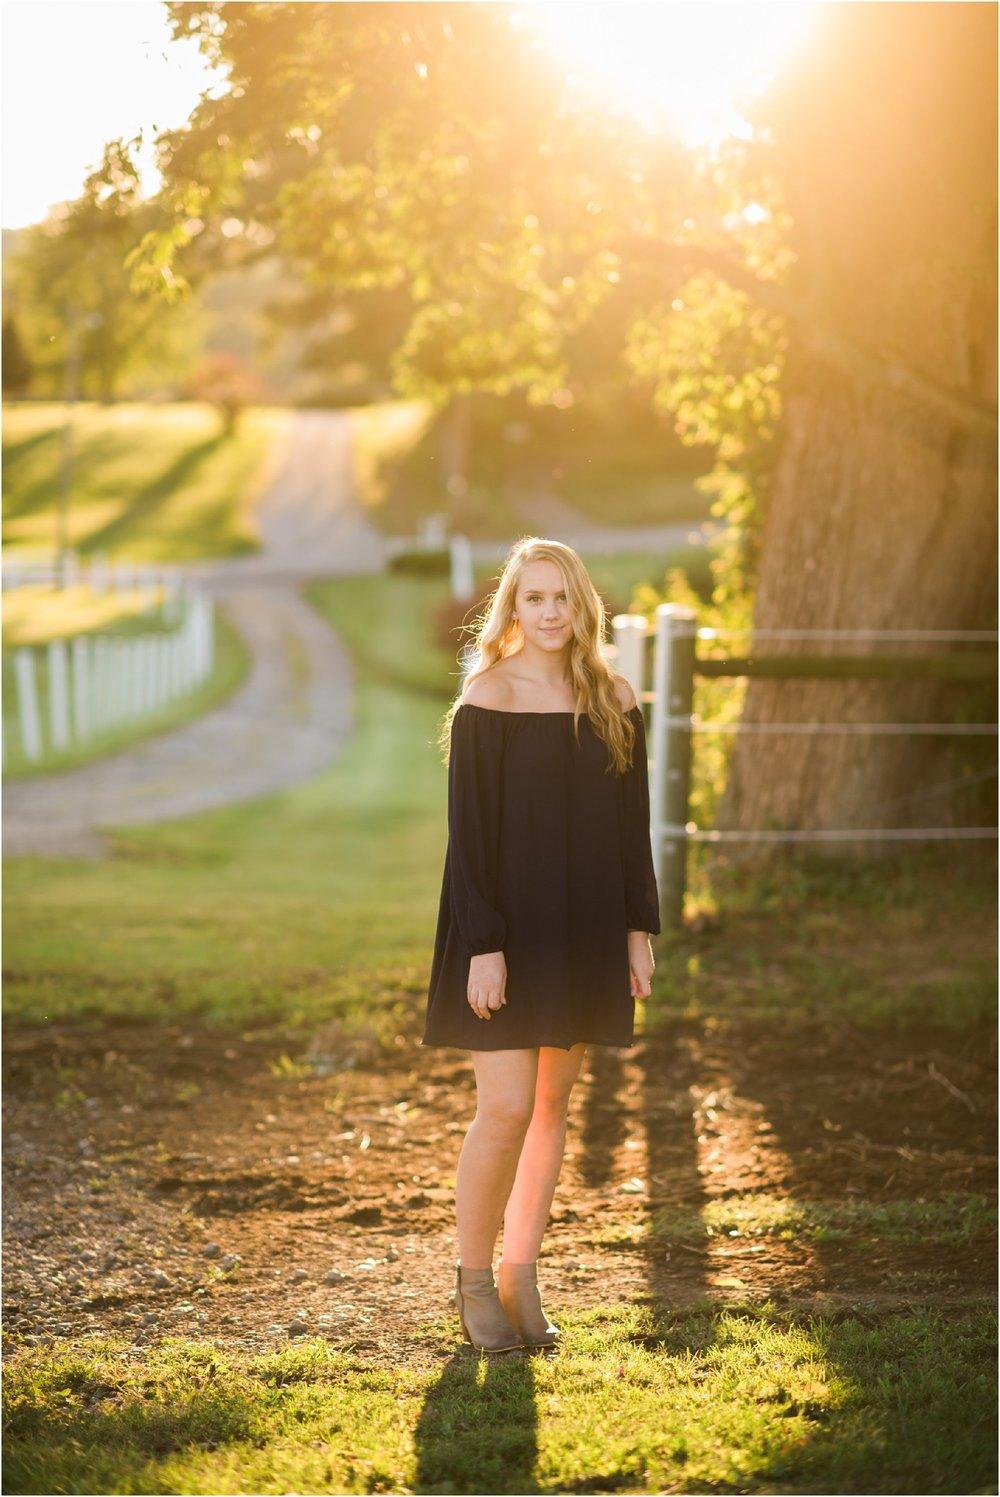 Pittsburgh Rachel Rossetti Senior Portrait Photography_0246.jpg